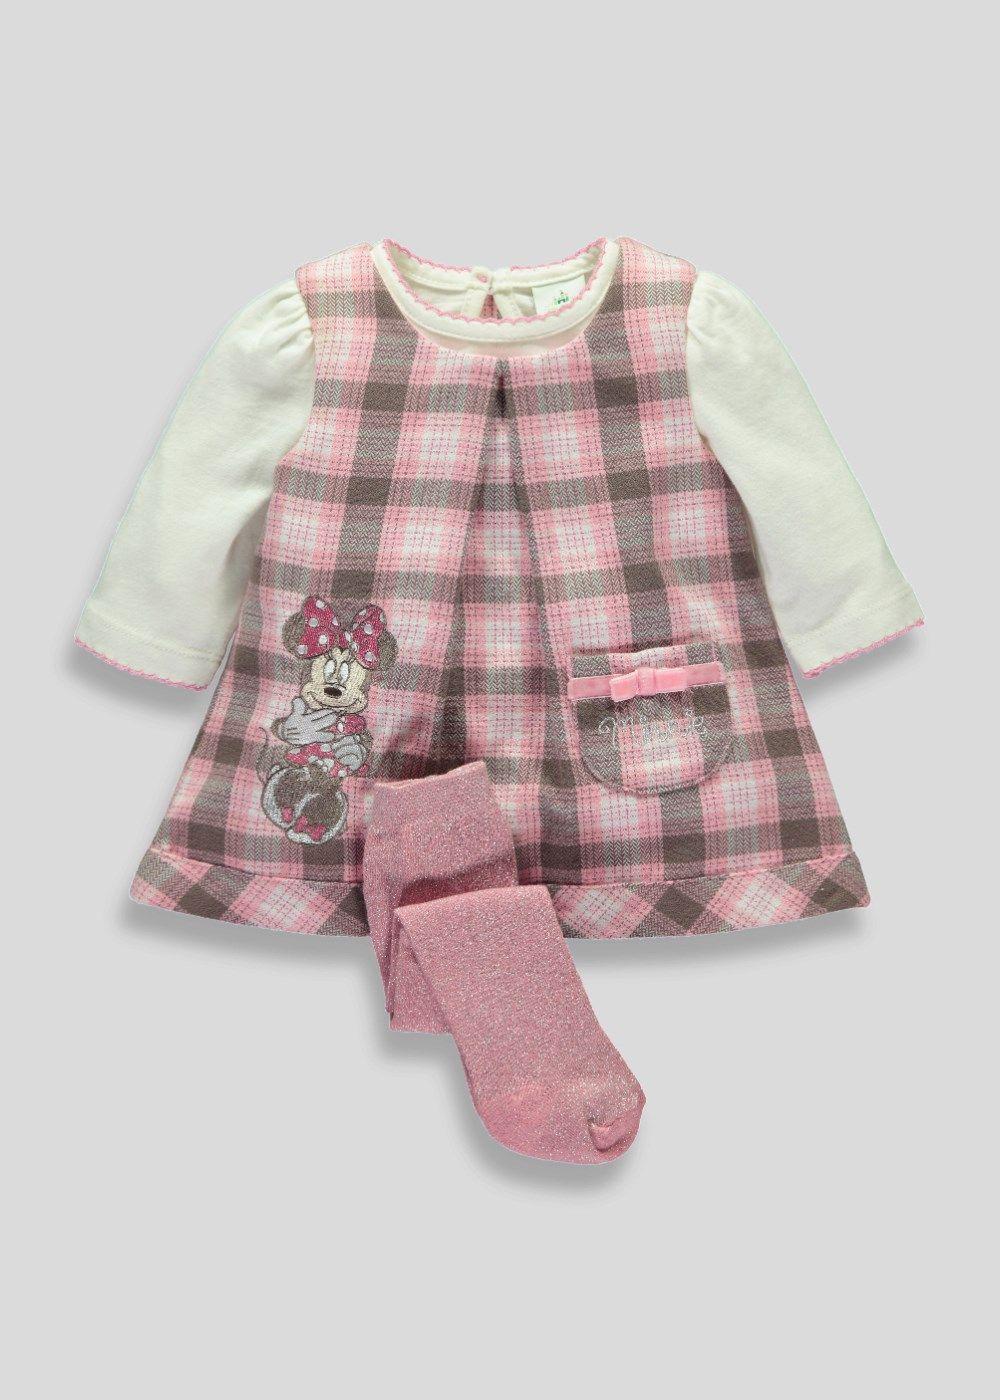 df61c5acbb5 Girls Disney Minnie Mouse Dress Set (Newborn - 18mths) - Matalan ...